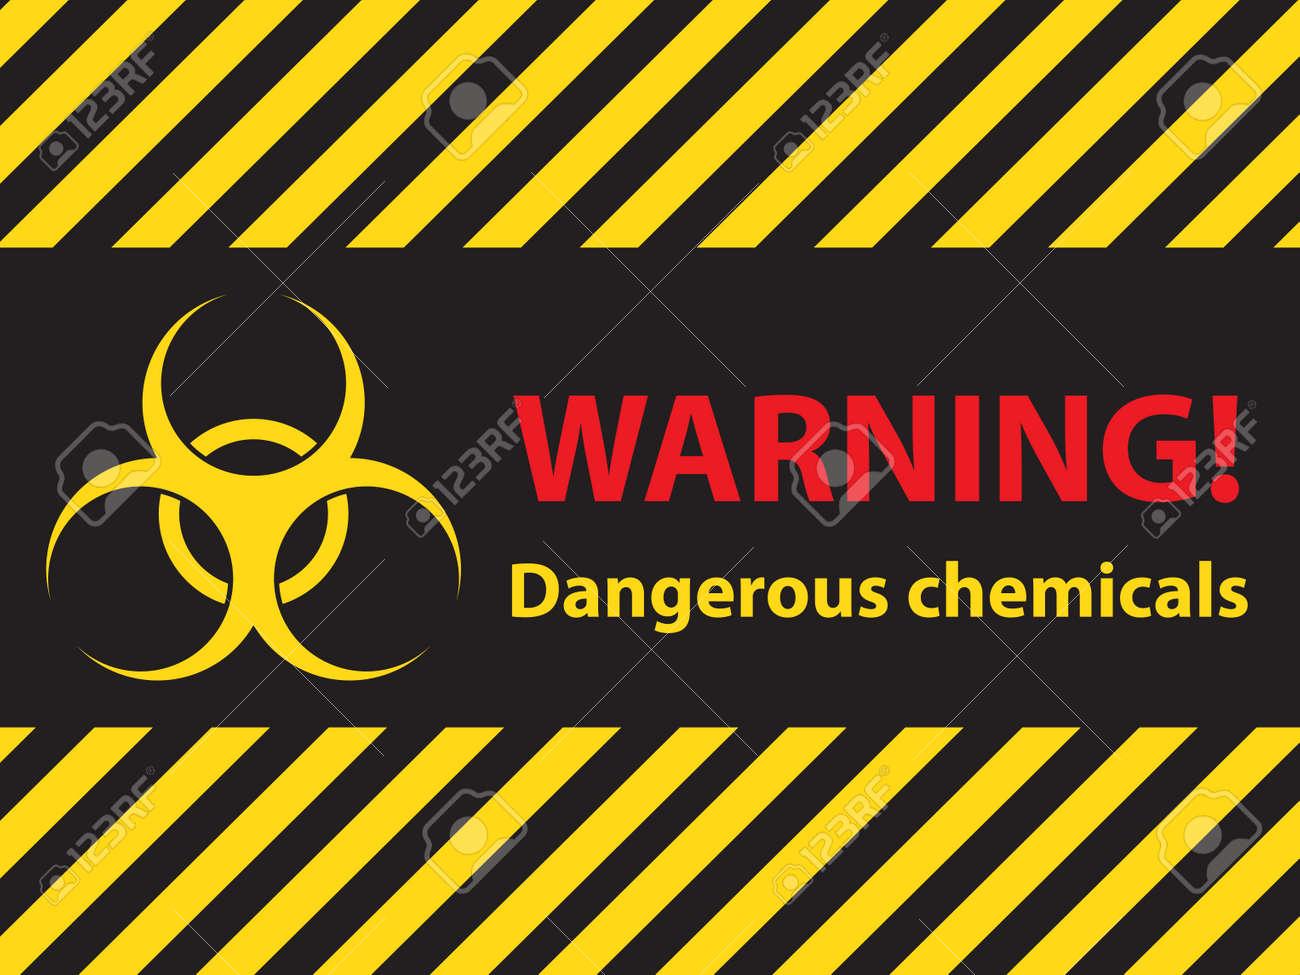 warning dangerous chemicals sign, illustration vector - 48706970